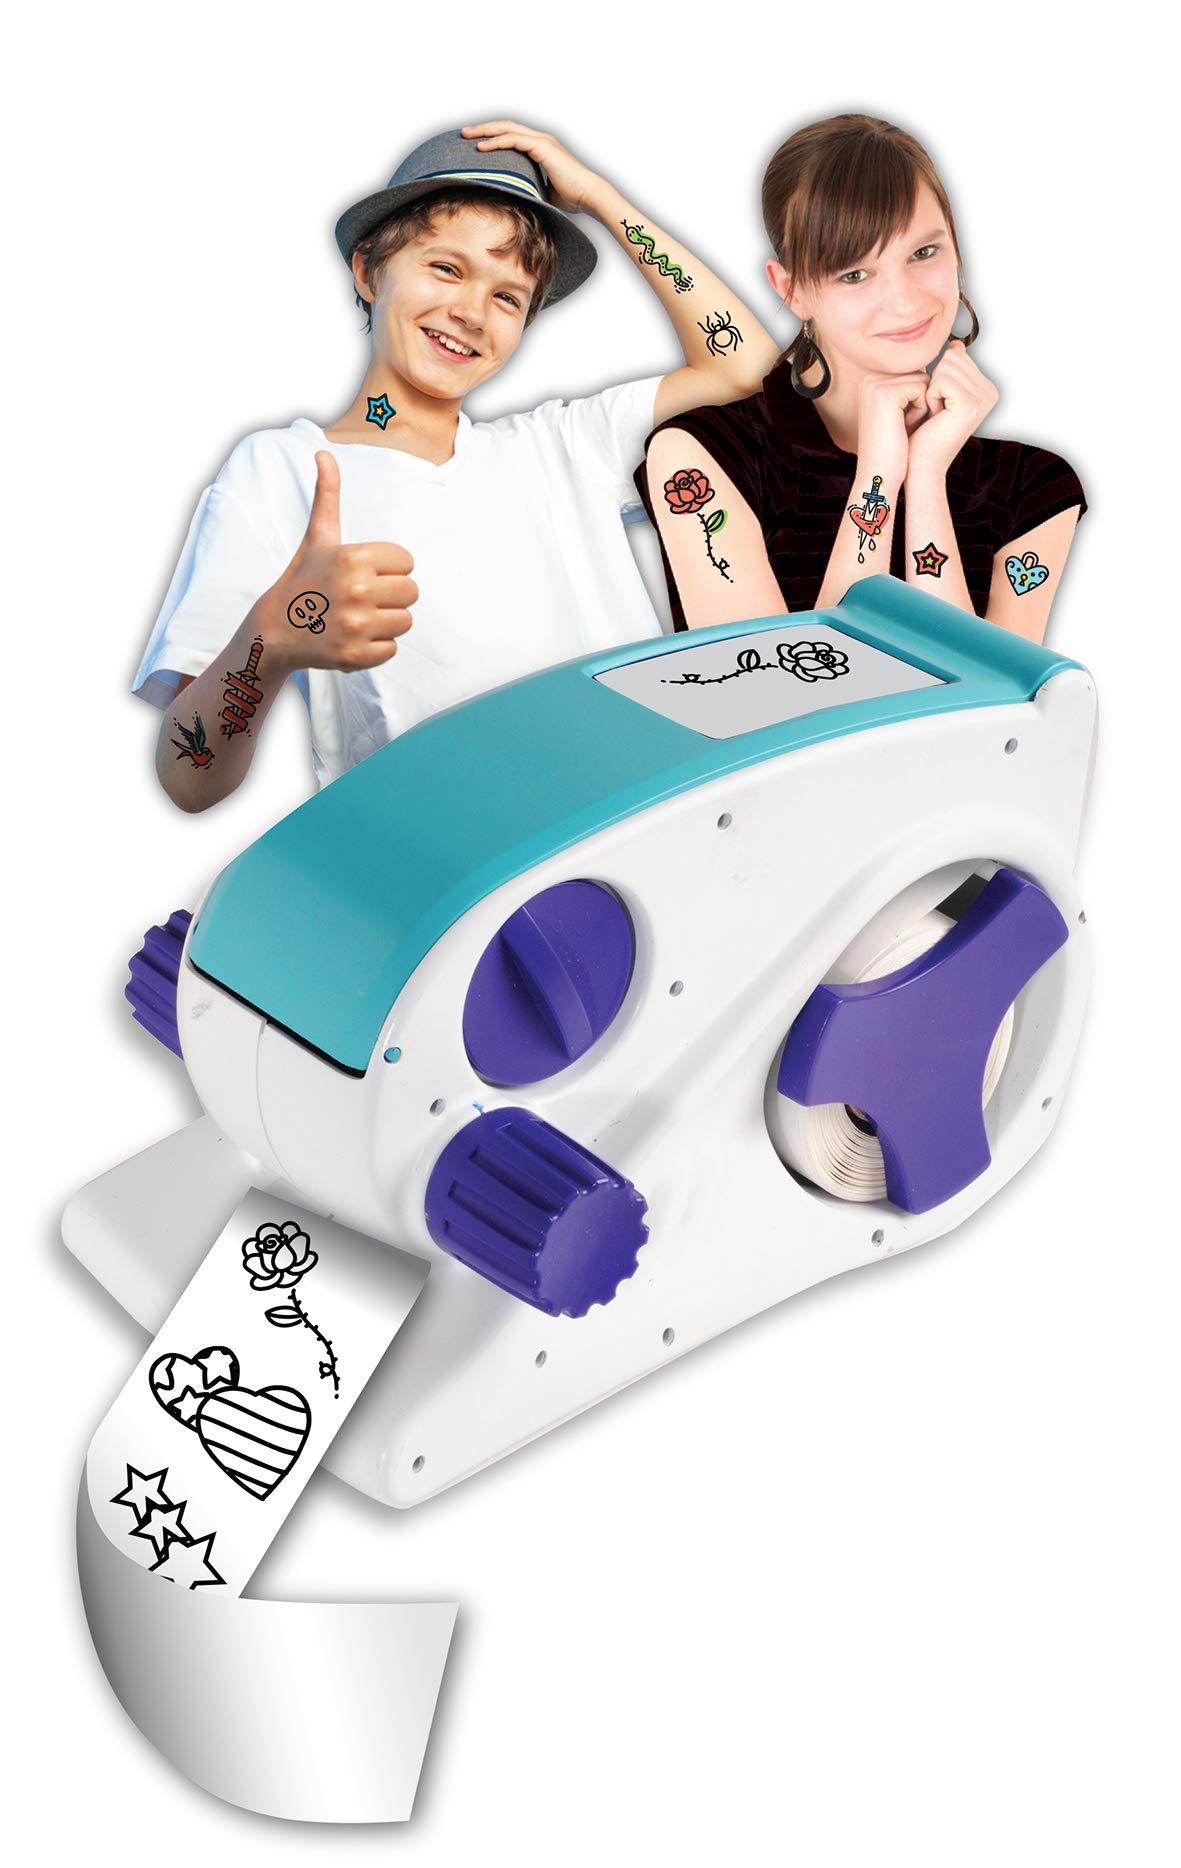 AMAV Super Tattoos Factory Toy Set for Kids - DIY Make Your Own Design Tattoos